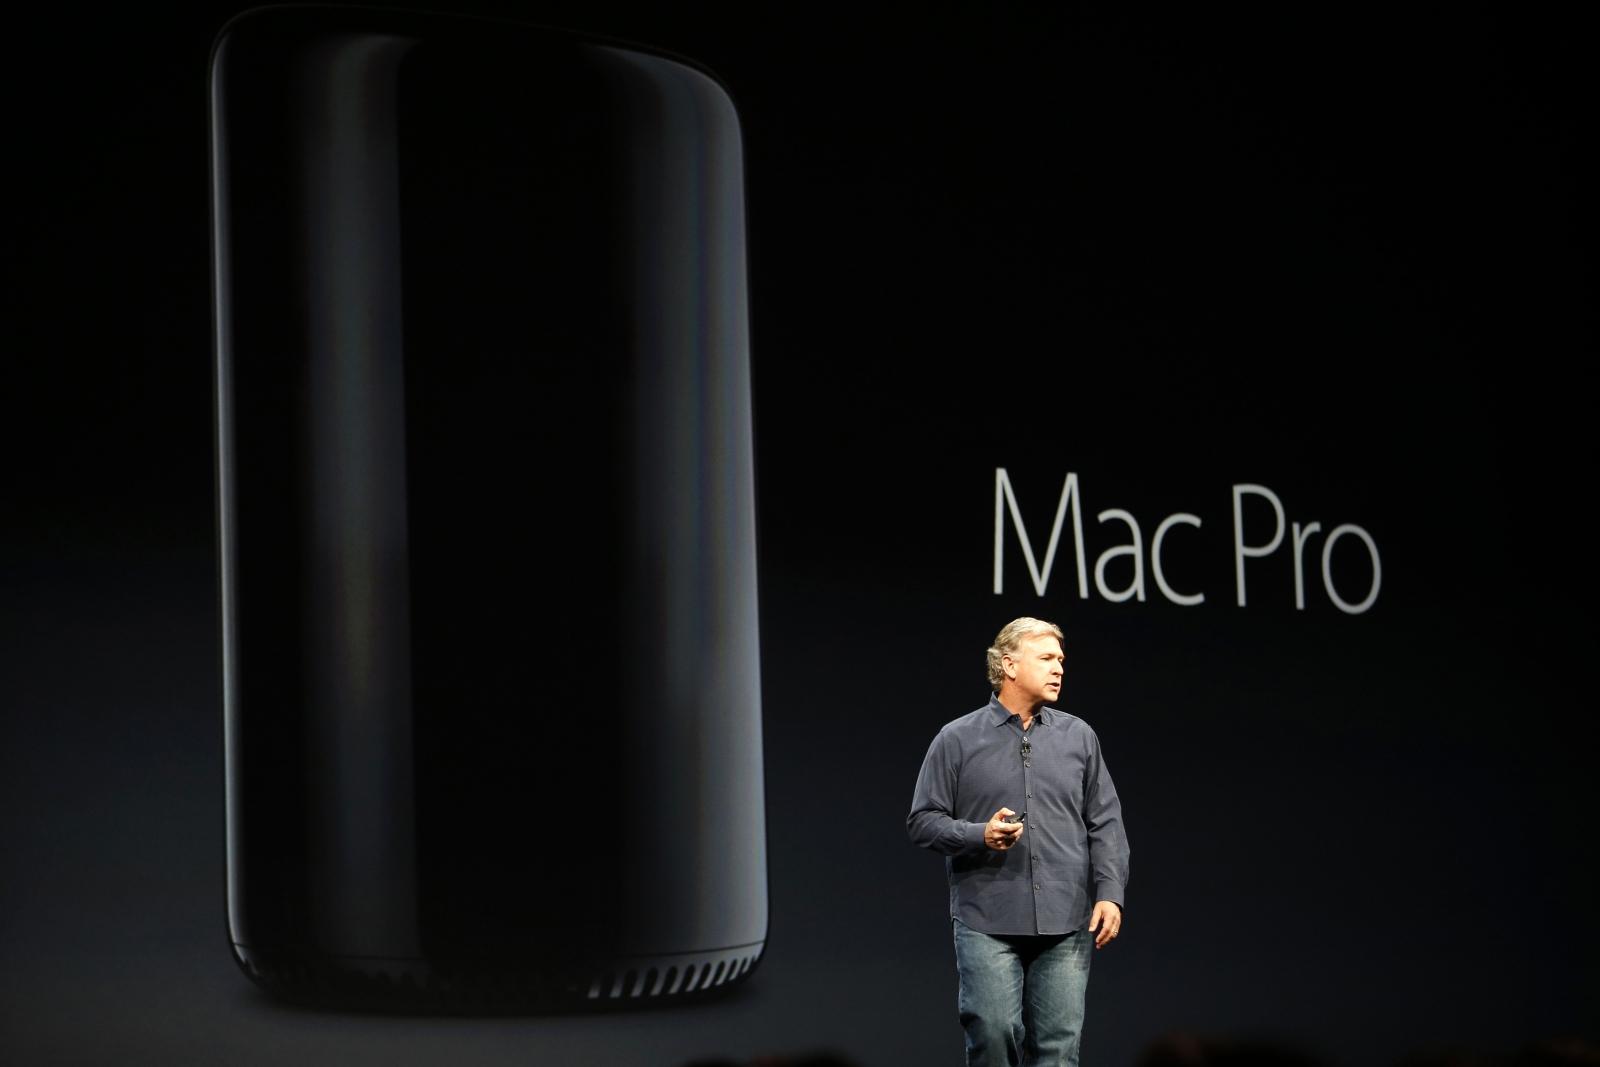 Phil Schiller introduces the Mac Pro